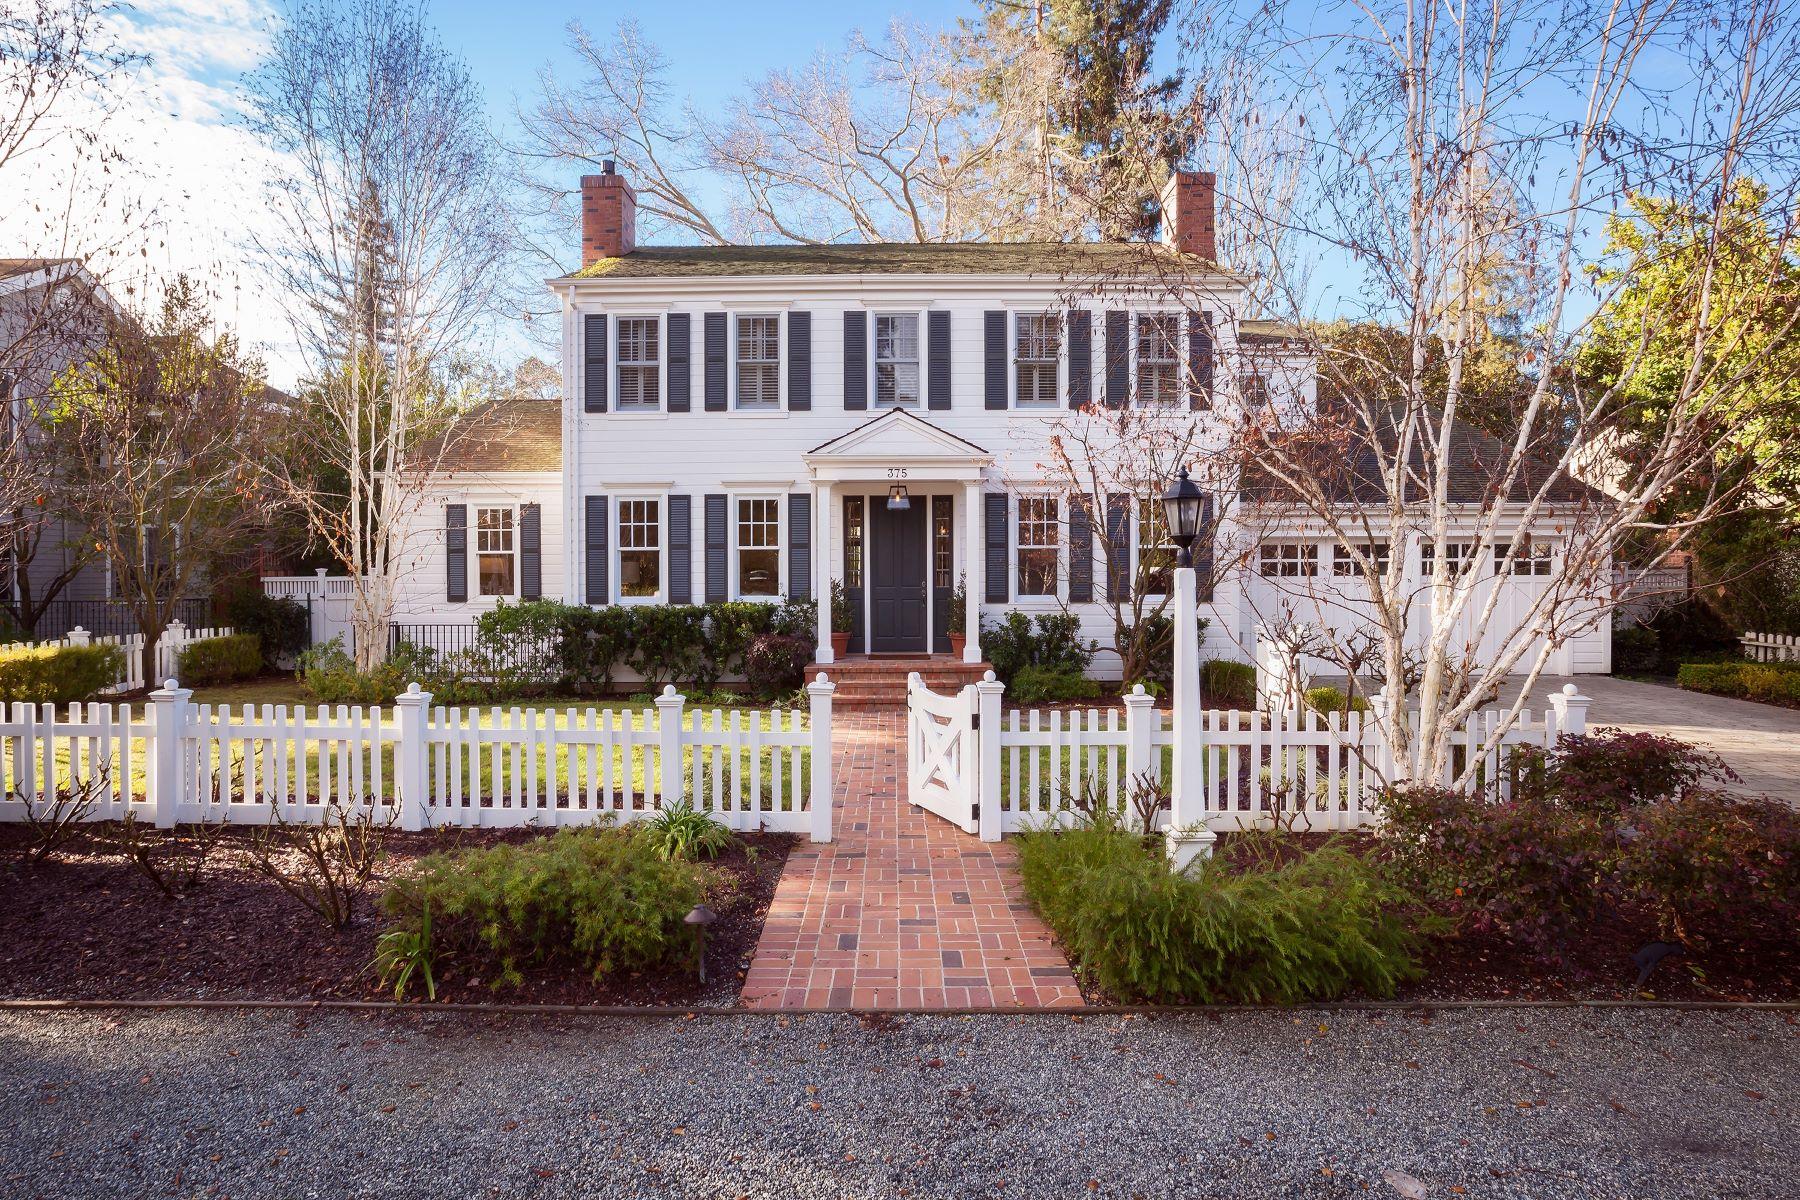 Single Family Home for Sale at 375 Santa Rita Ave Menlo Park, California 94025 United States